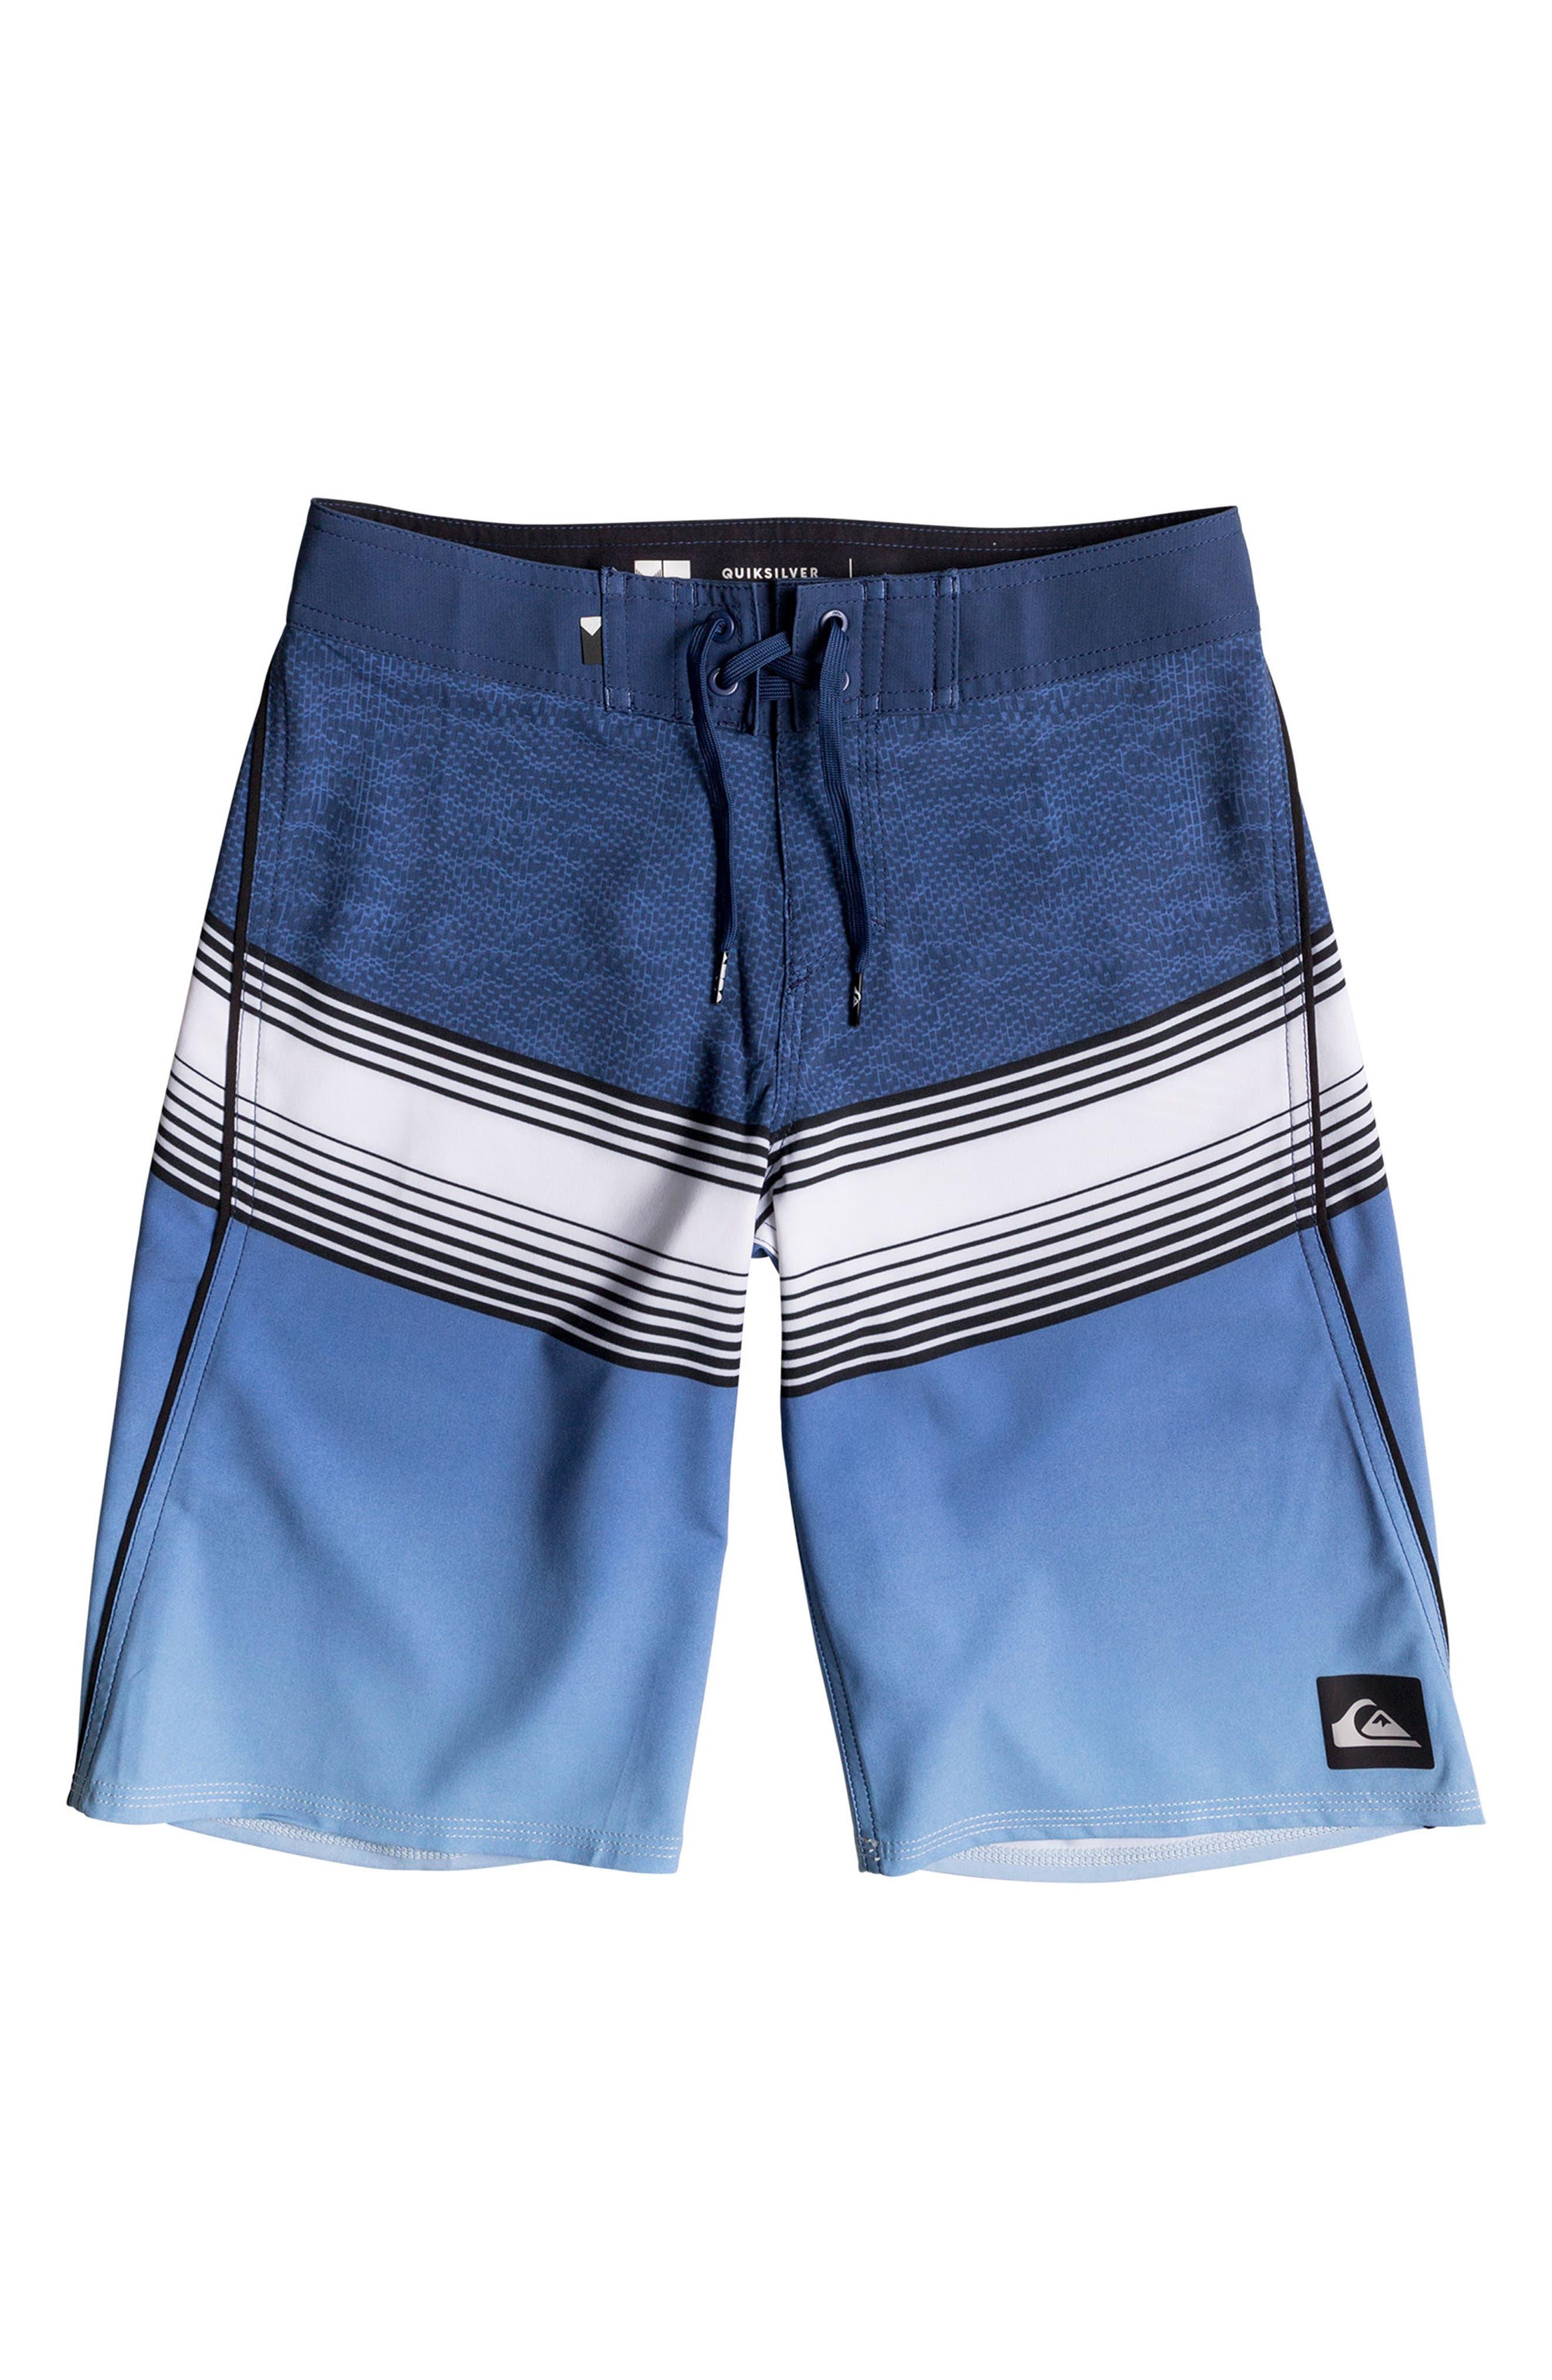 Quiksilver Division Fade Board Shorts (Big Boys)